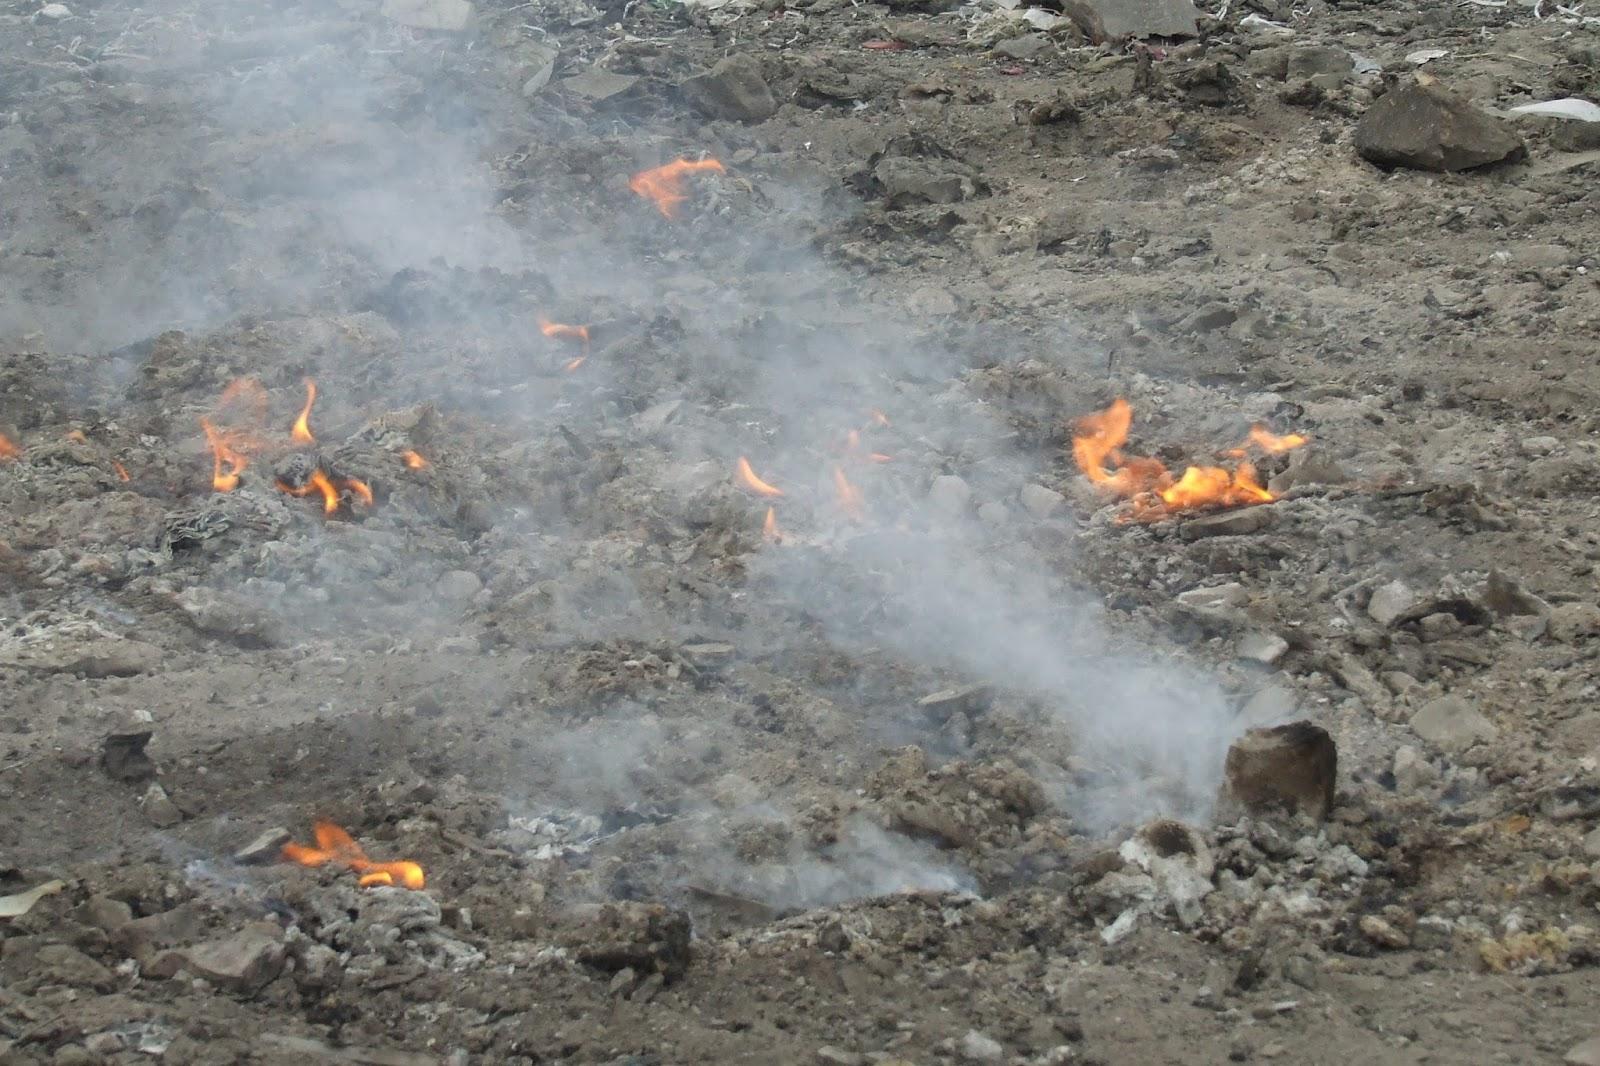 Athreya Kidambi Kavitha Kidambi Environmental Pollution